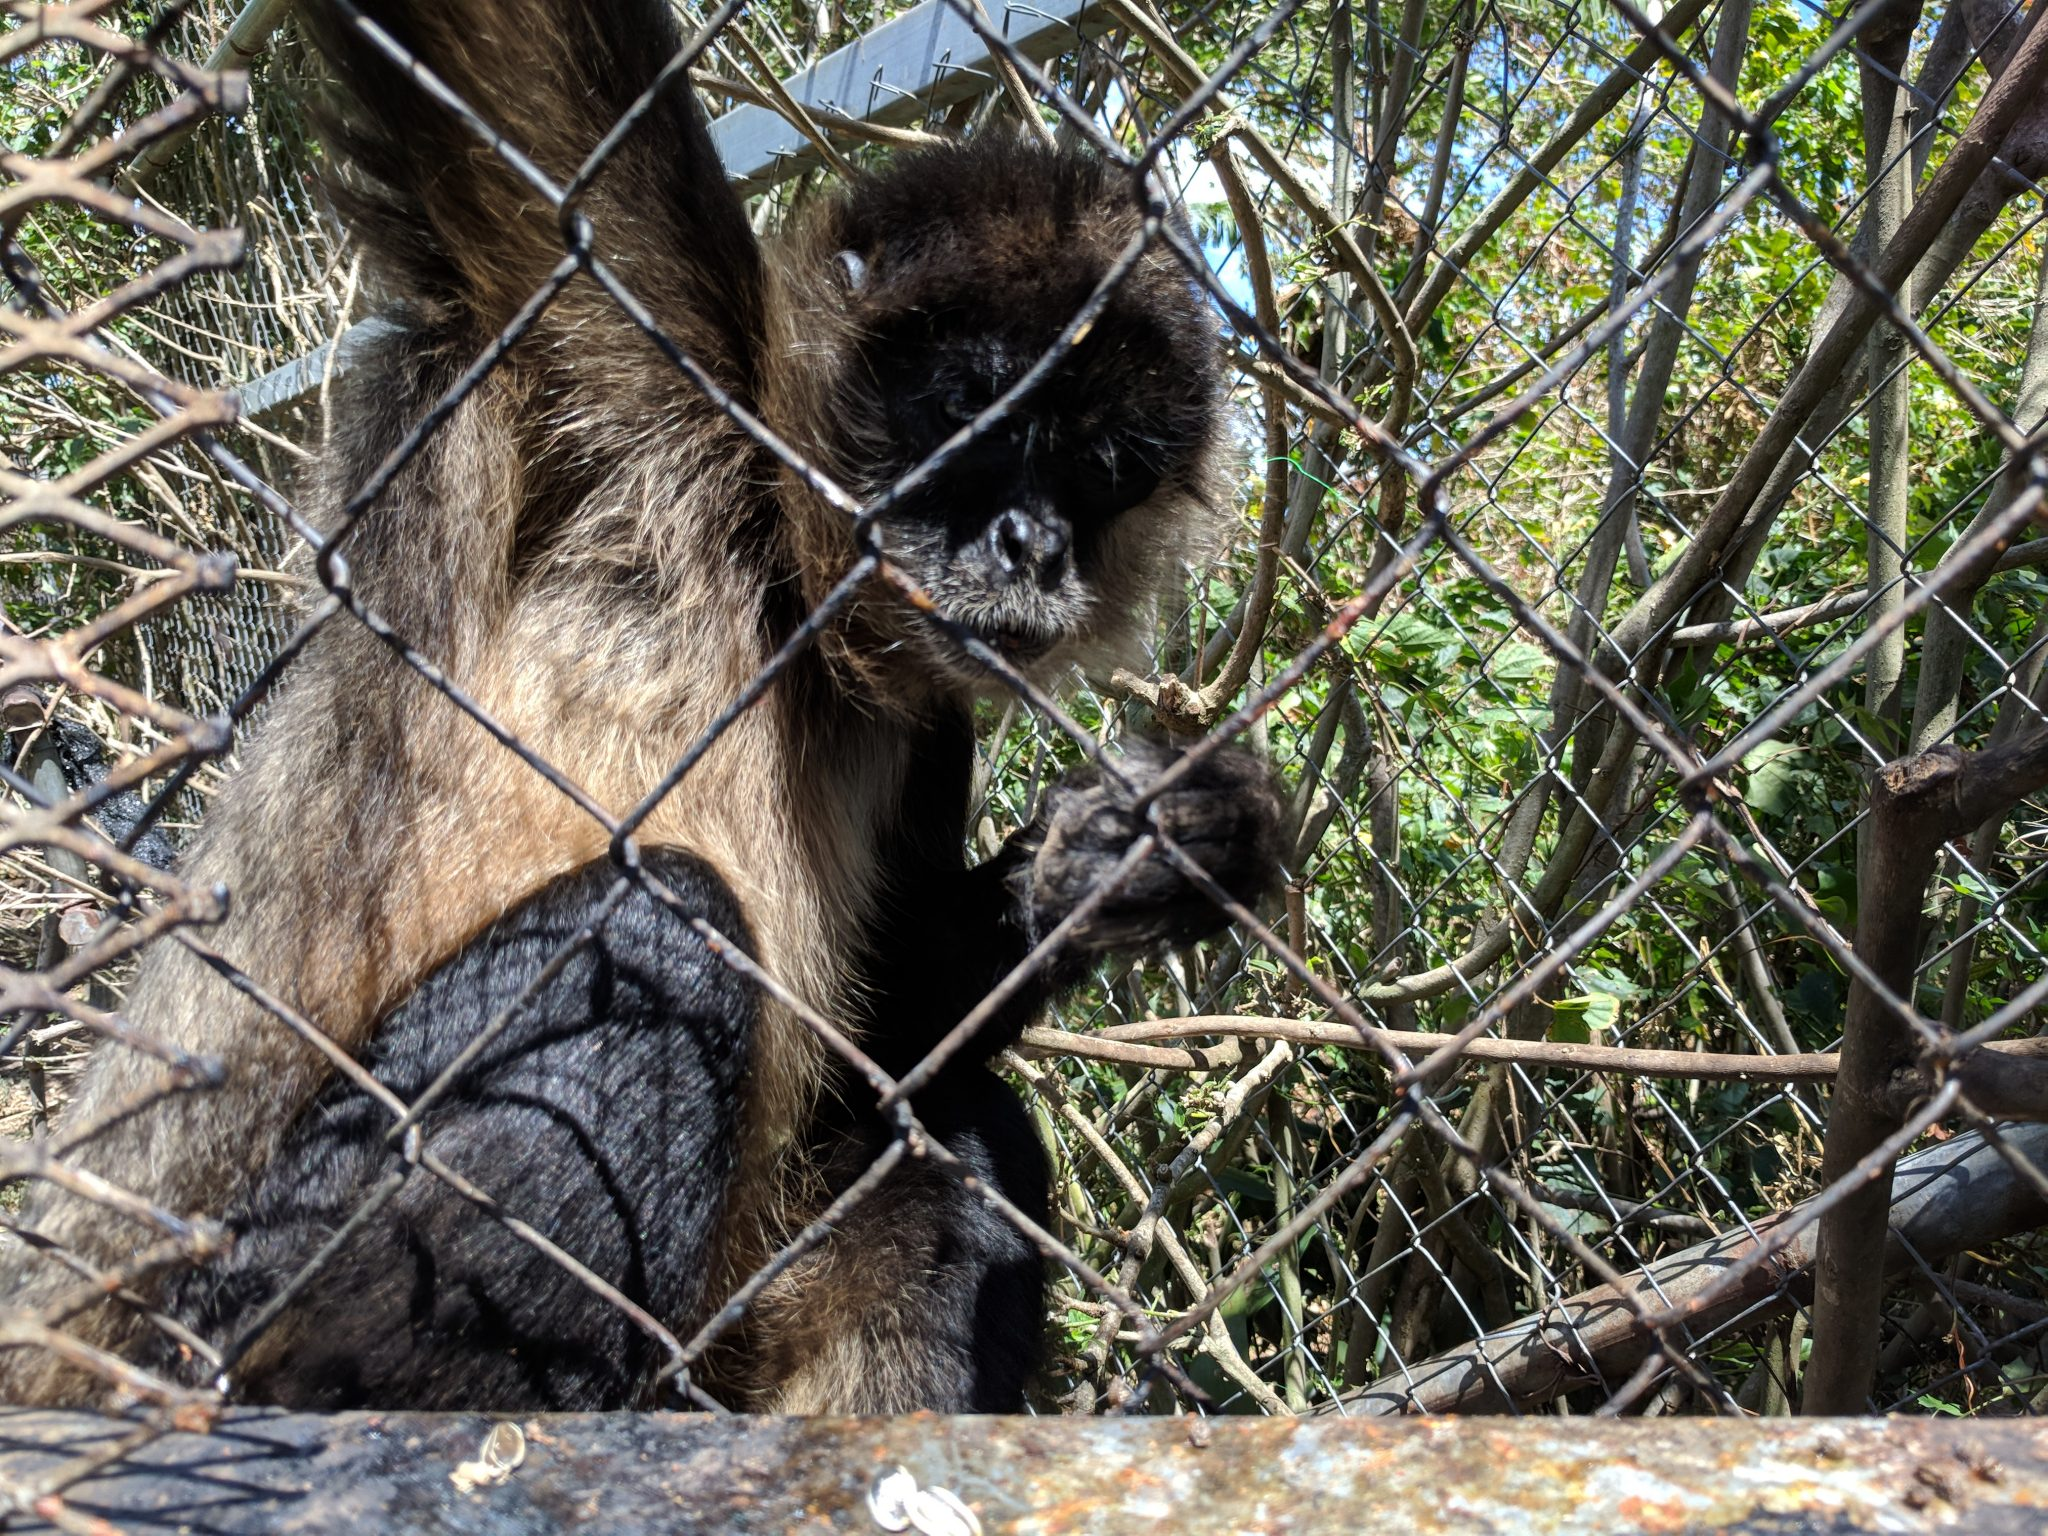 Jungla de Panama spider monkey